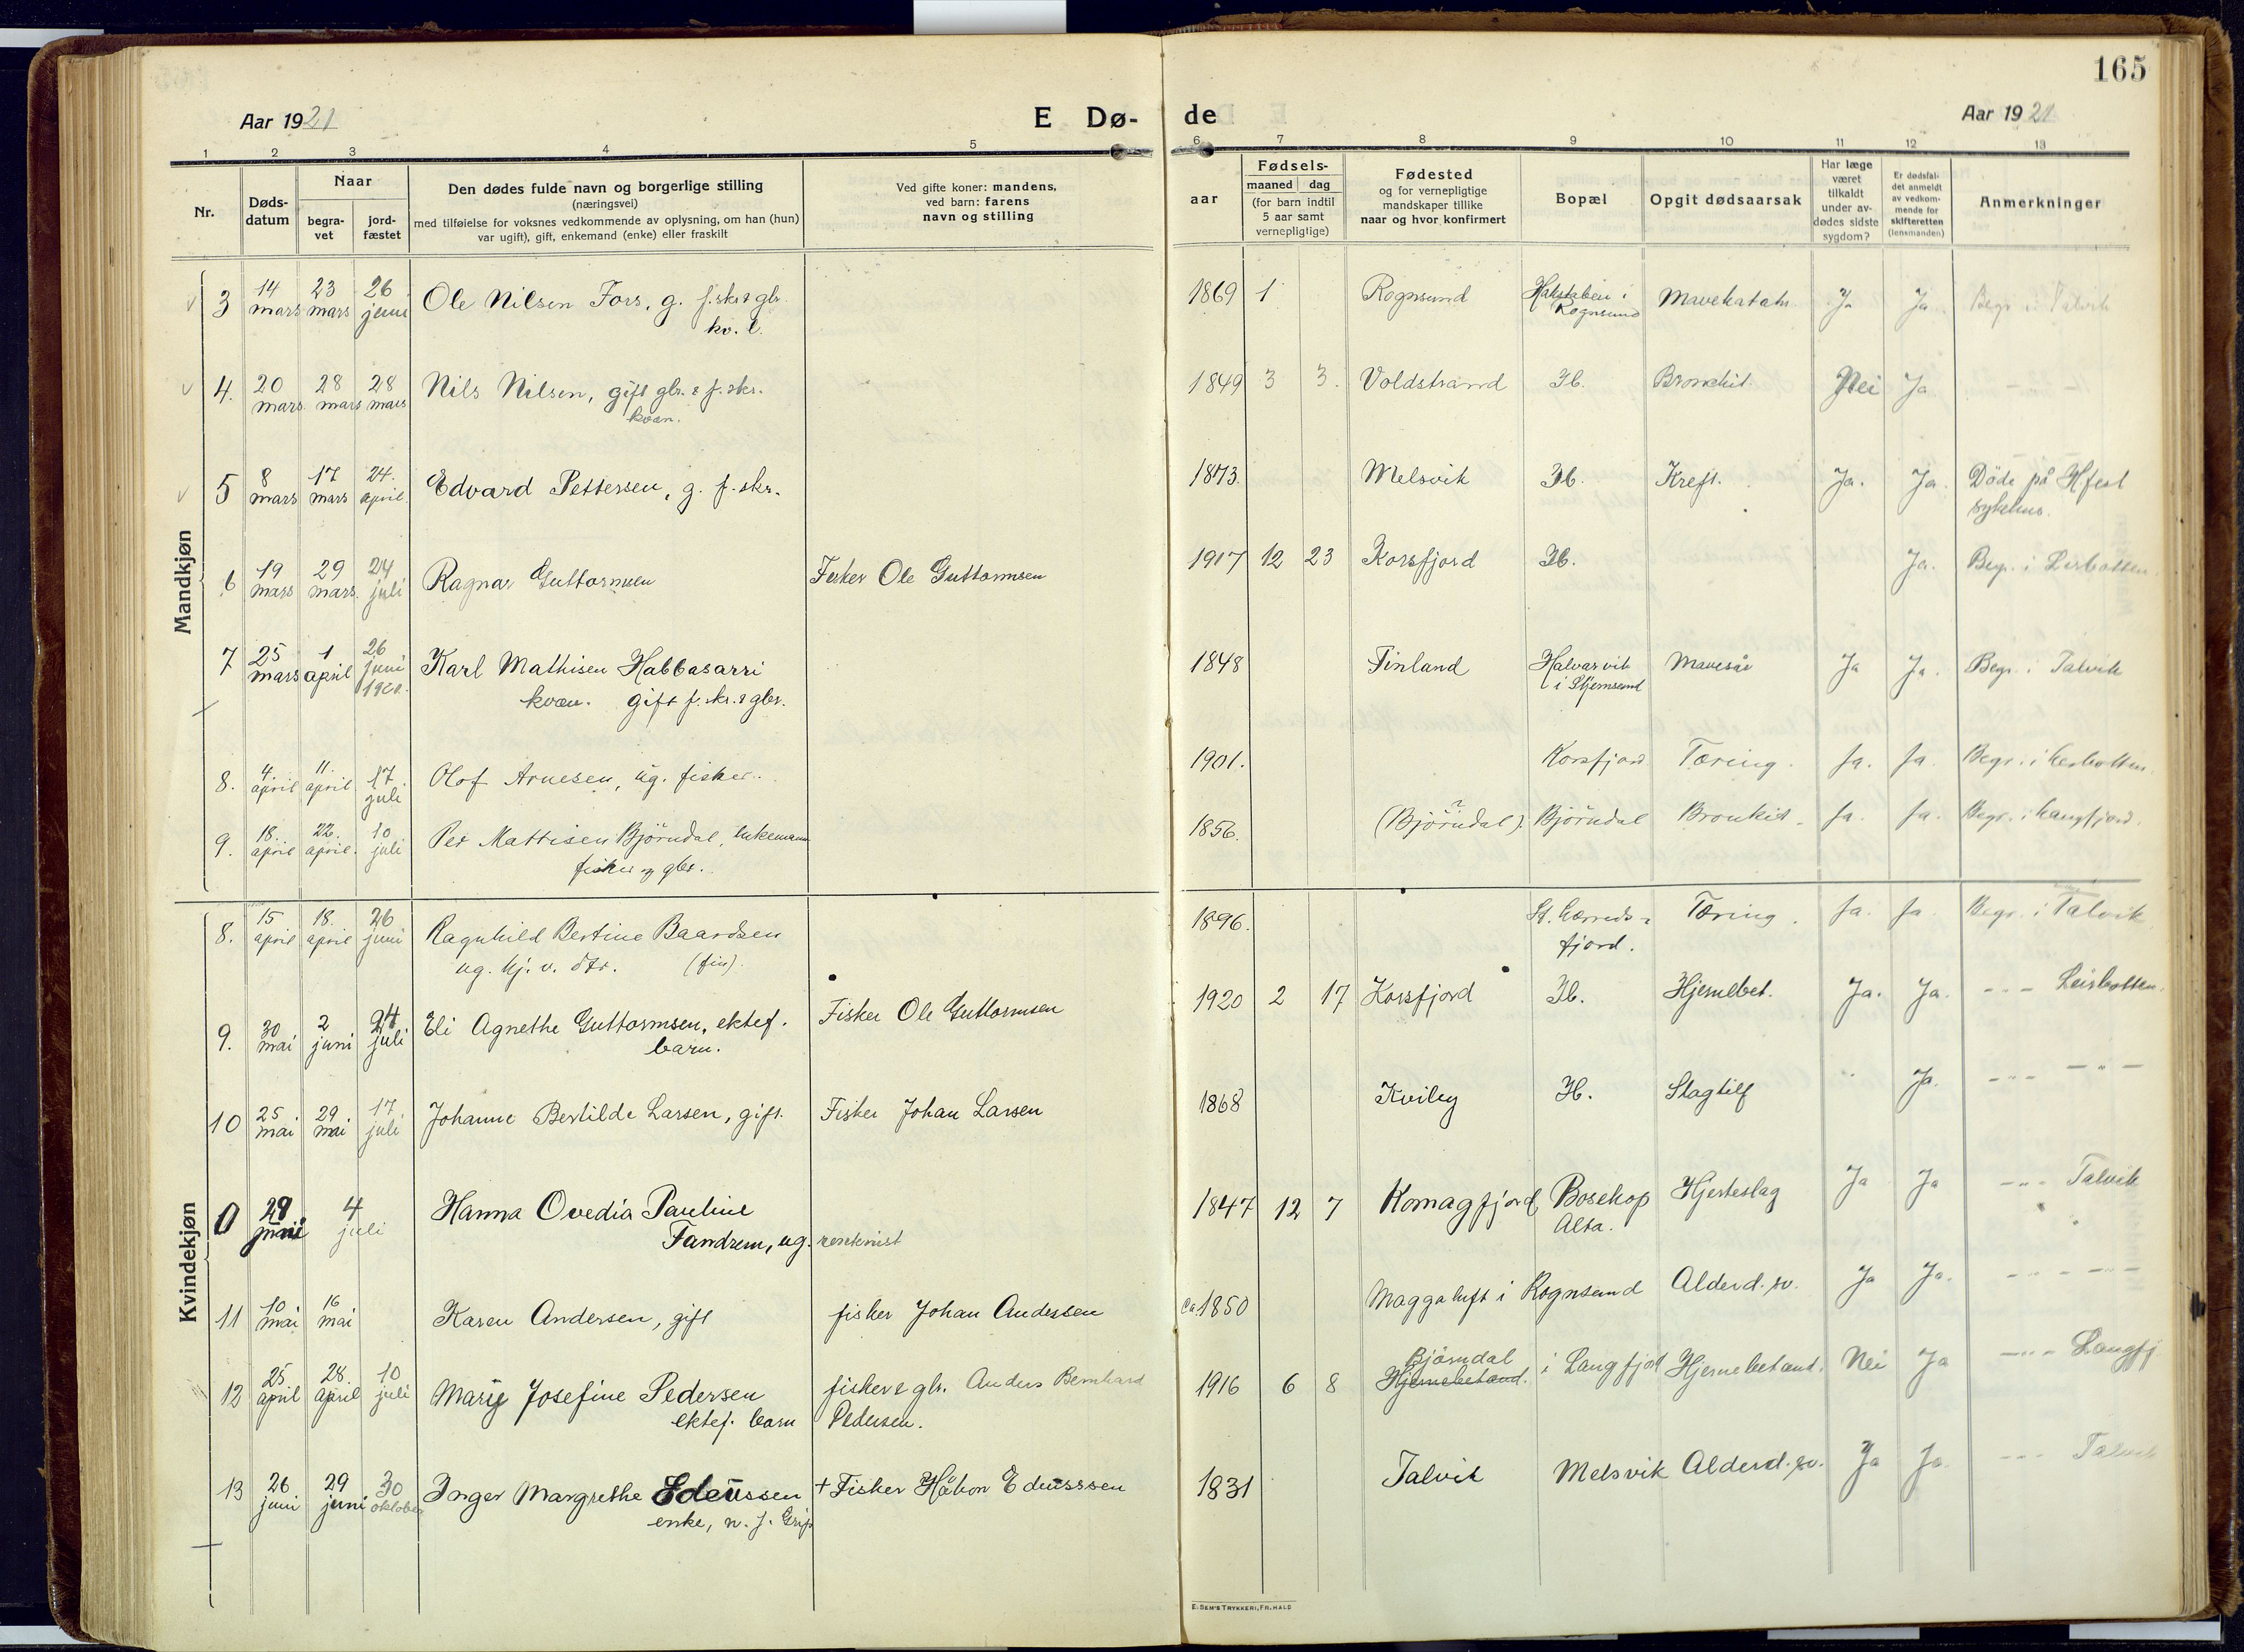 SATØ, Talvik sokneprestkontor, H/Ha/L0018kirke: Ministerialbok nr. 18, 1915-1924, s. 165